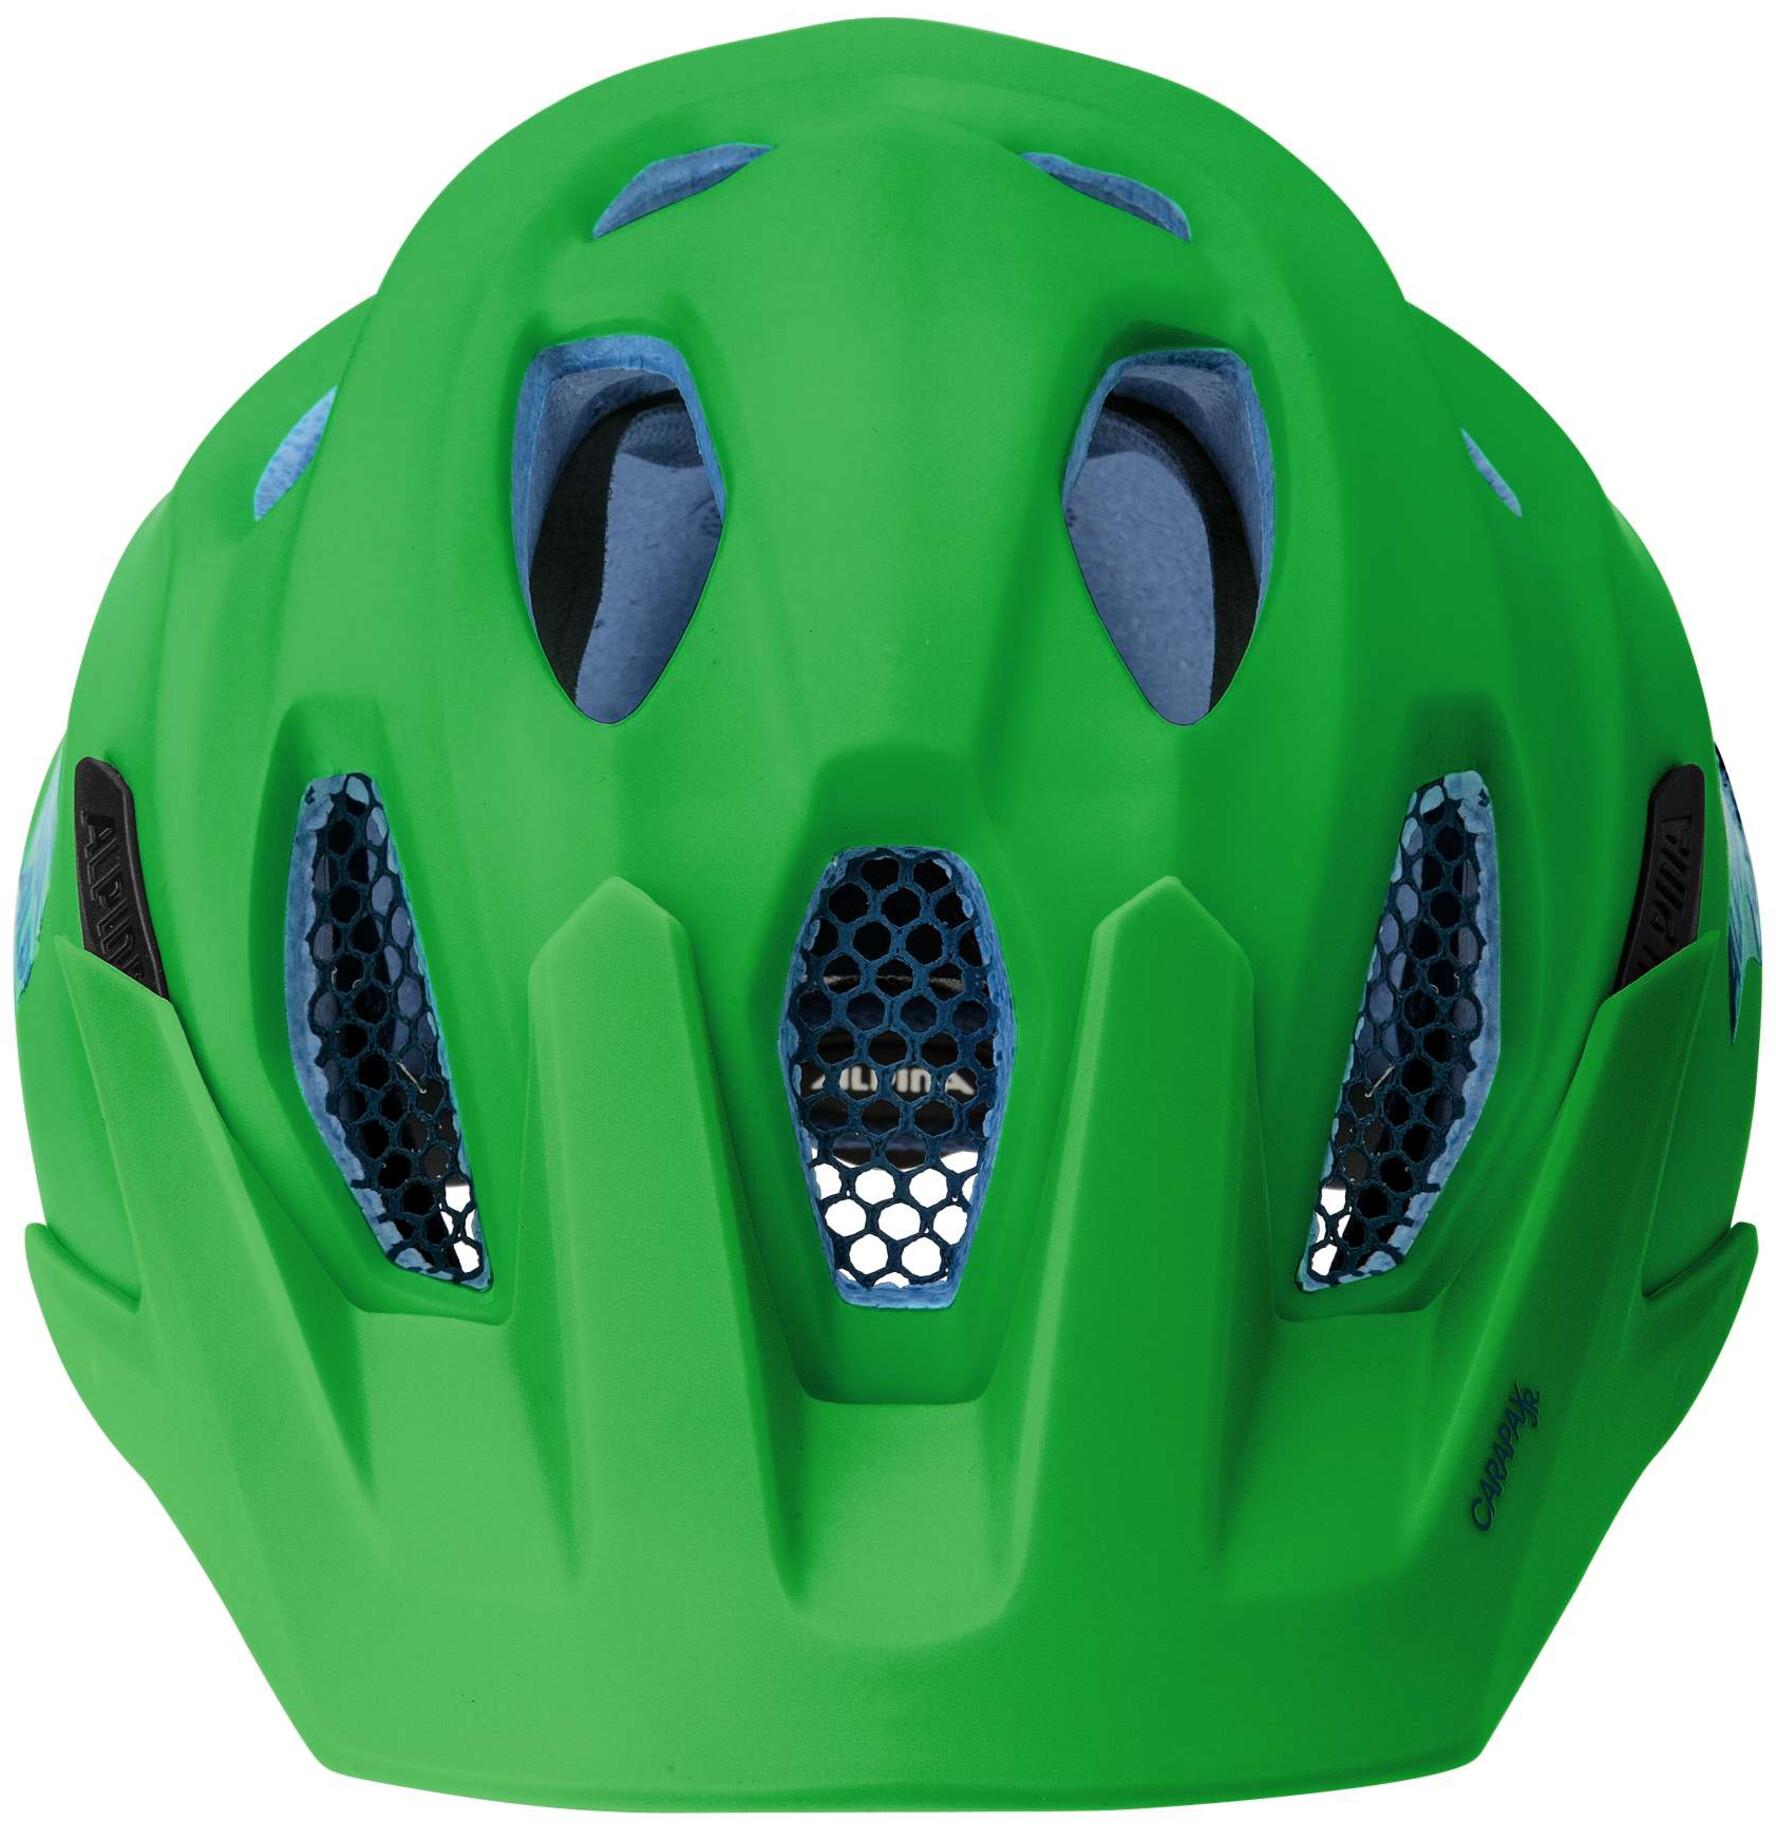 alpina carapax jr casco de bicicleta ni os verde. Black Bedroom Furniture Sets. Home Design Ideas